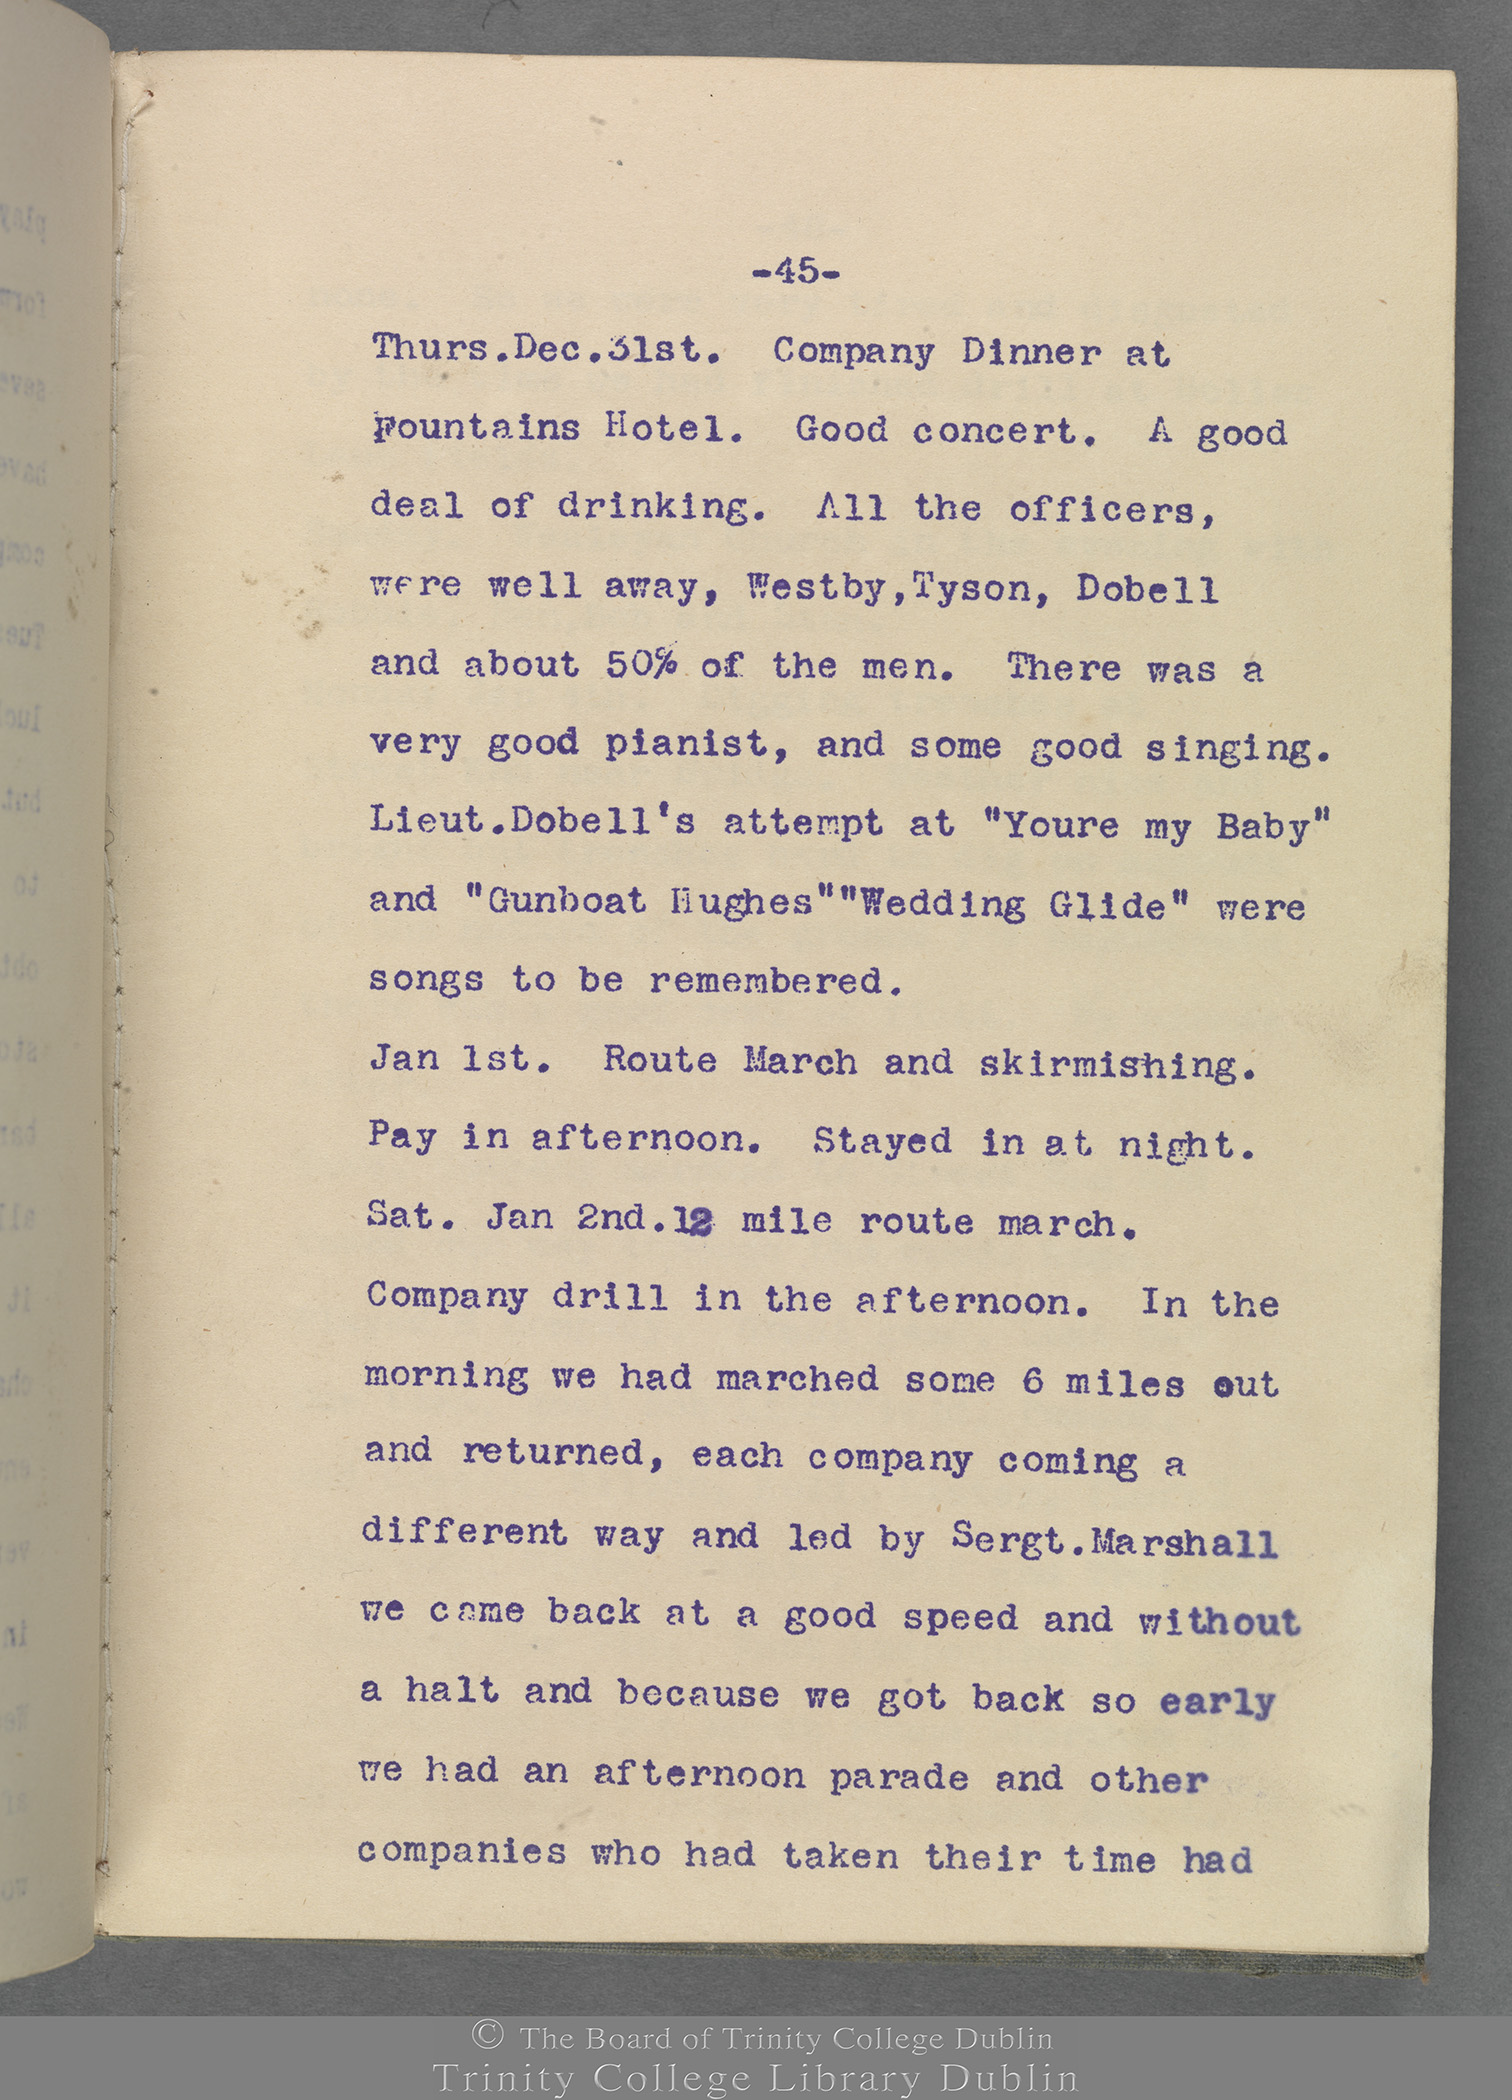 TCD MS 10853 folio 45 recto